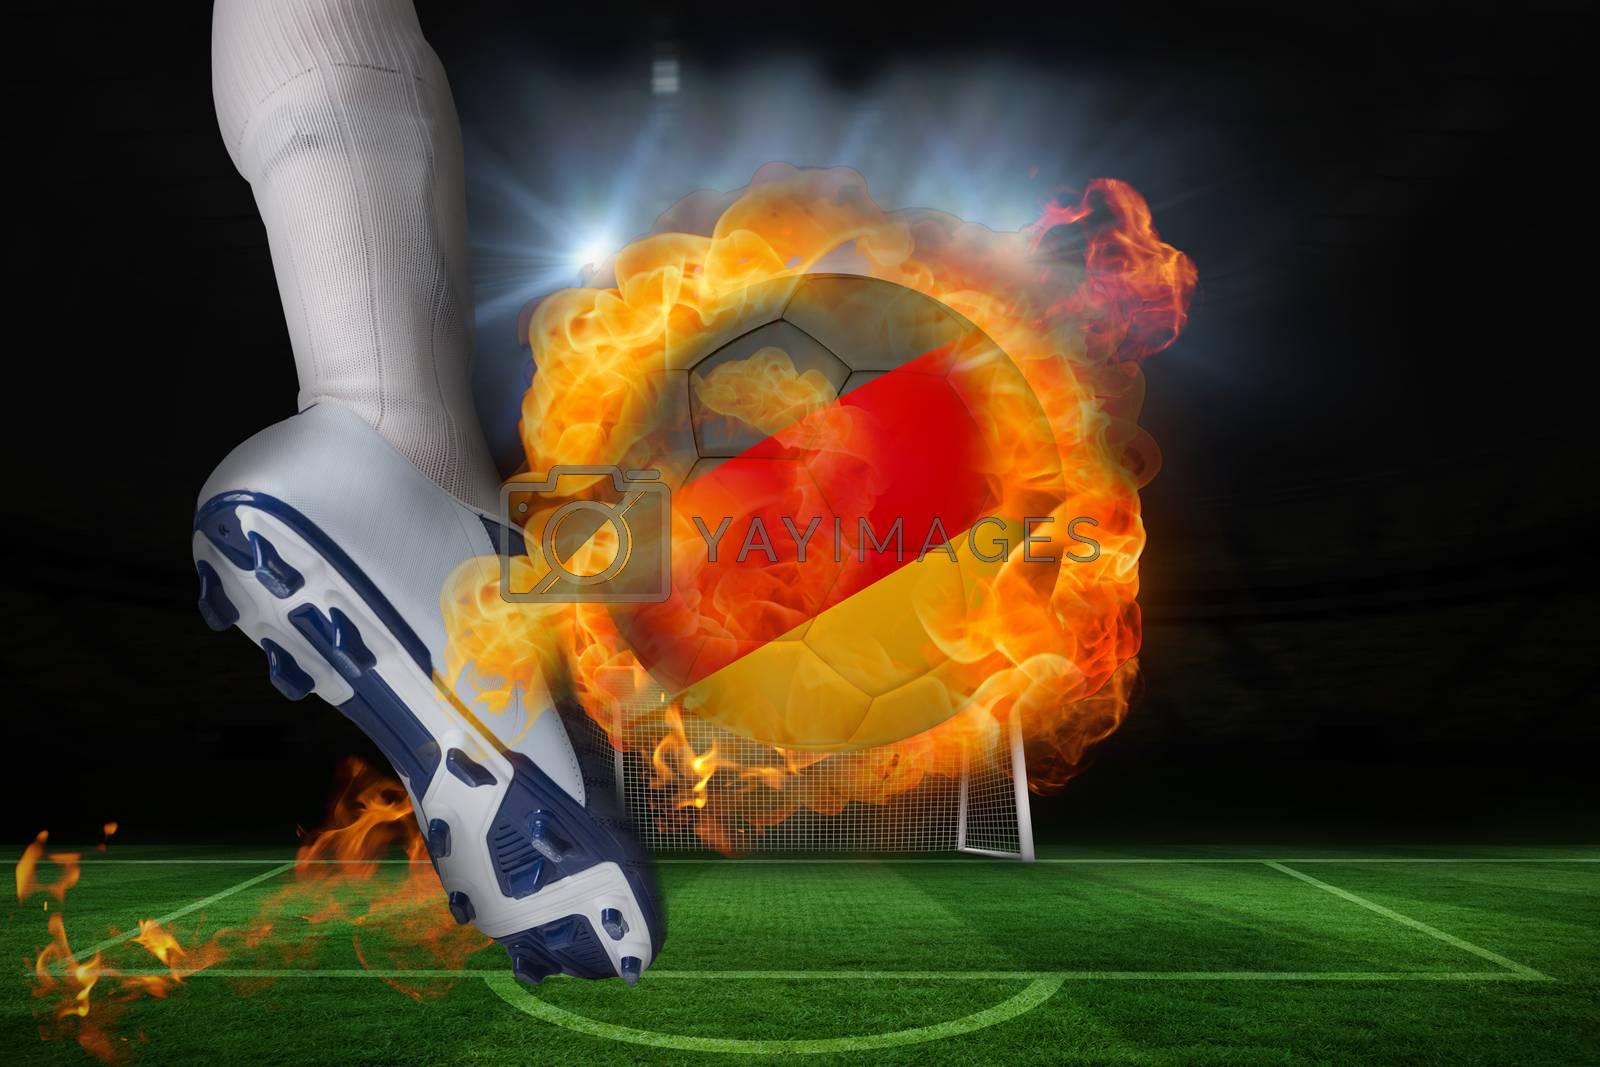 Football player kicking flaming germany flag ball by Wavebreakmedia